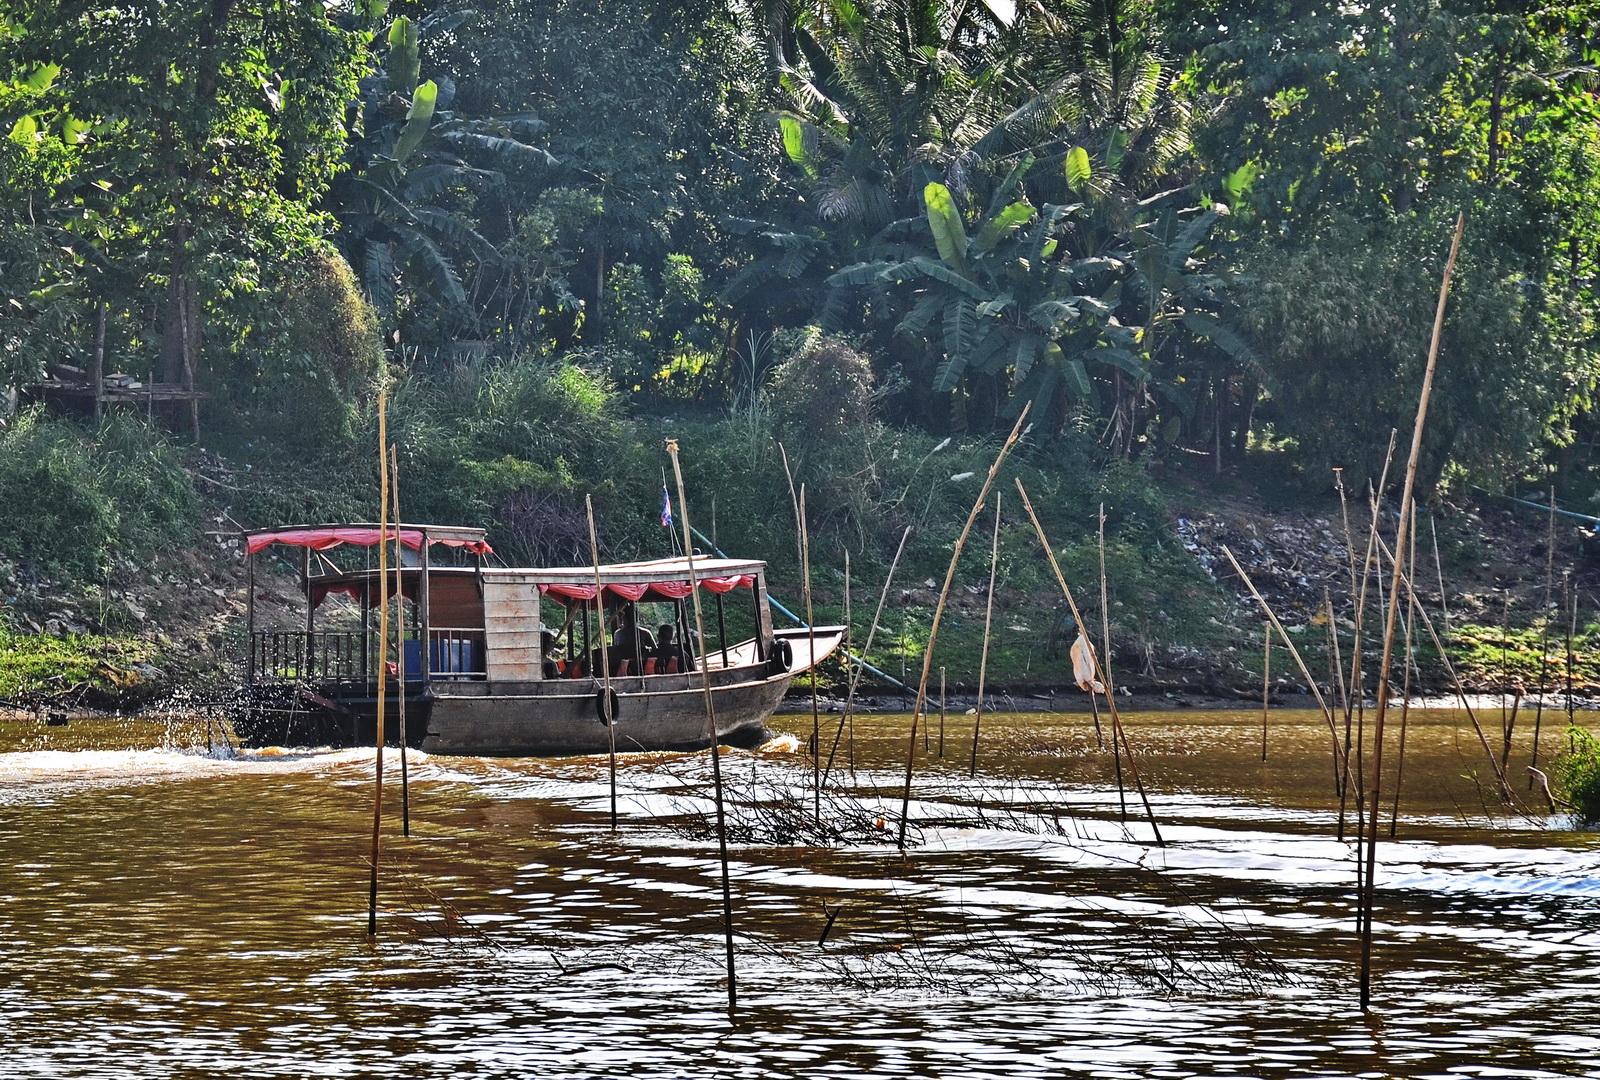 Cambodia Boat Trip – Siem Reap to Battambang